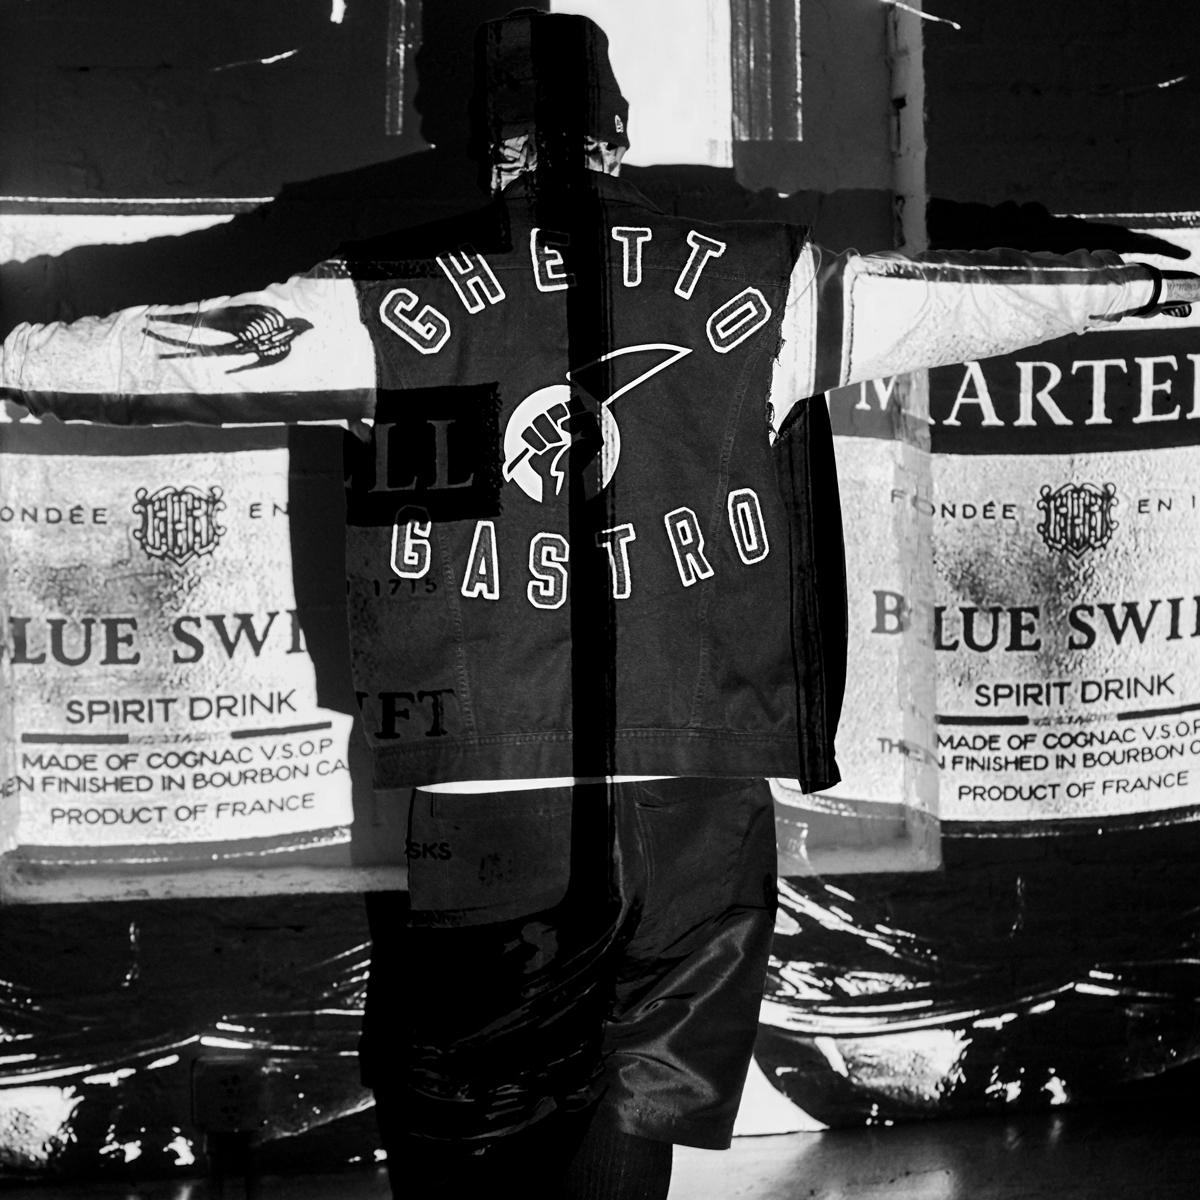 FY19_MAR_BLUESWIFT_ALWAYSON_NATIONAL_LIFESTYLE_INSTAGRAM_STILL_1x1_GhettoGastro-392.jpg